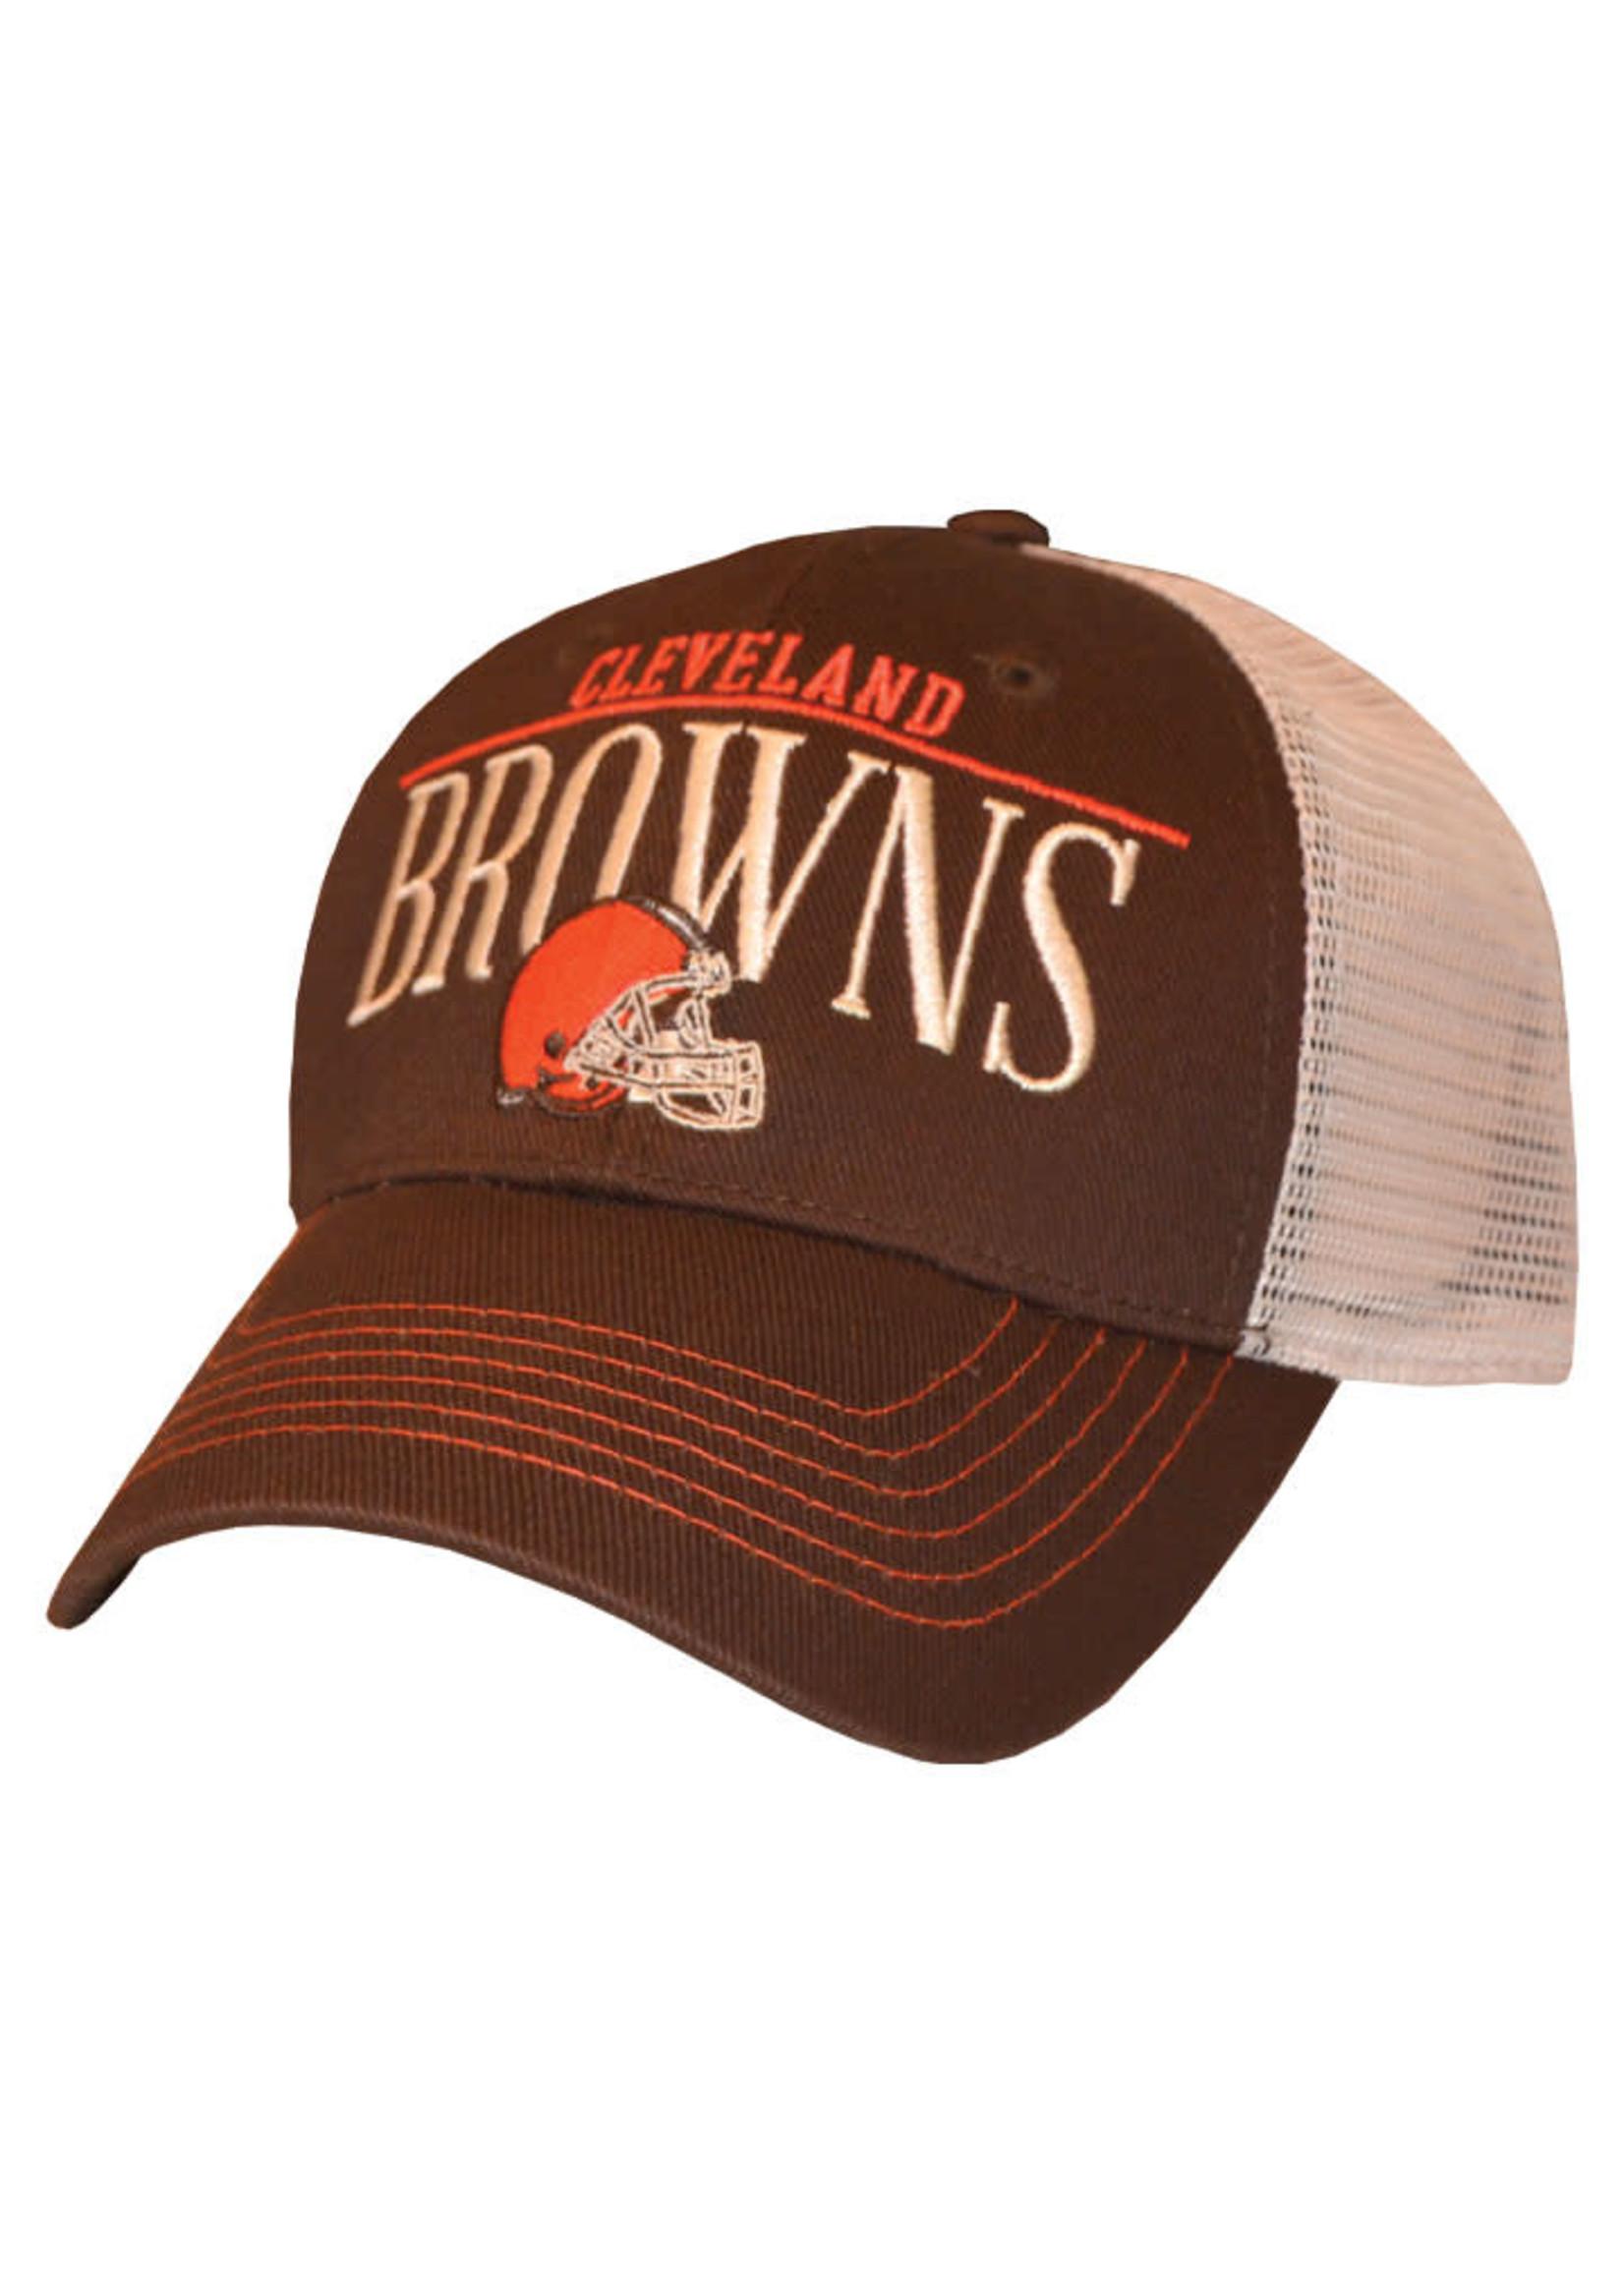 Cleveland Browns Straightaway Trucker Snapback